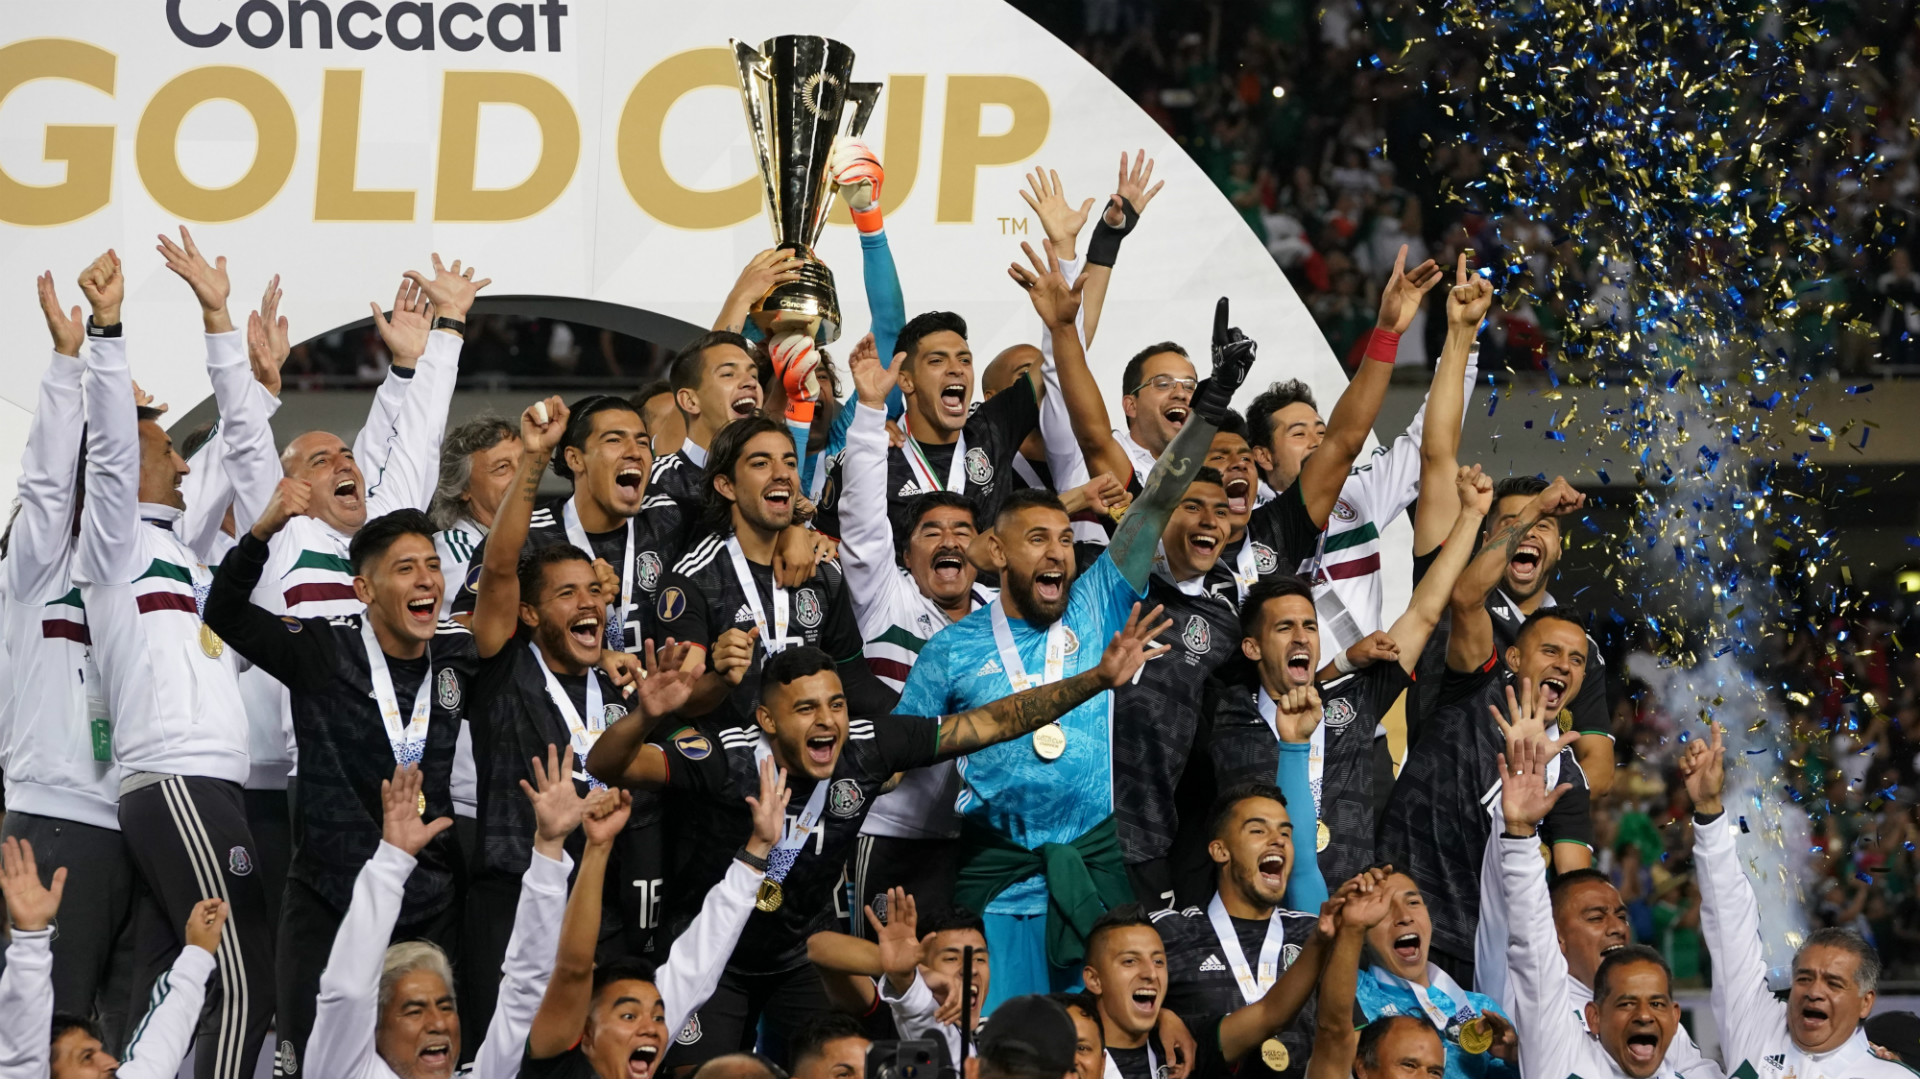 Mexico Gold Cup grades: Ochoa and Guardado stand out, while Araujo Jimenez disappoint for El Tri